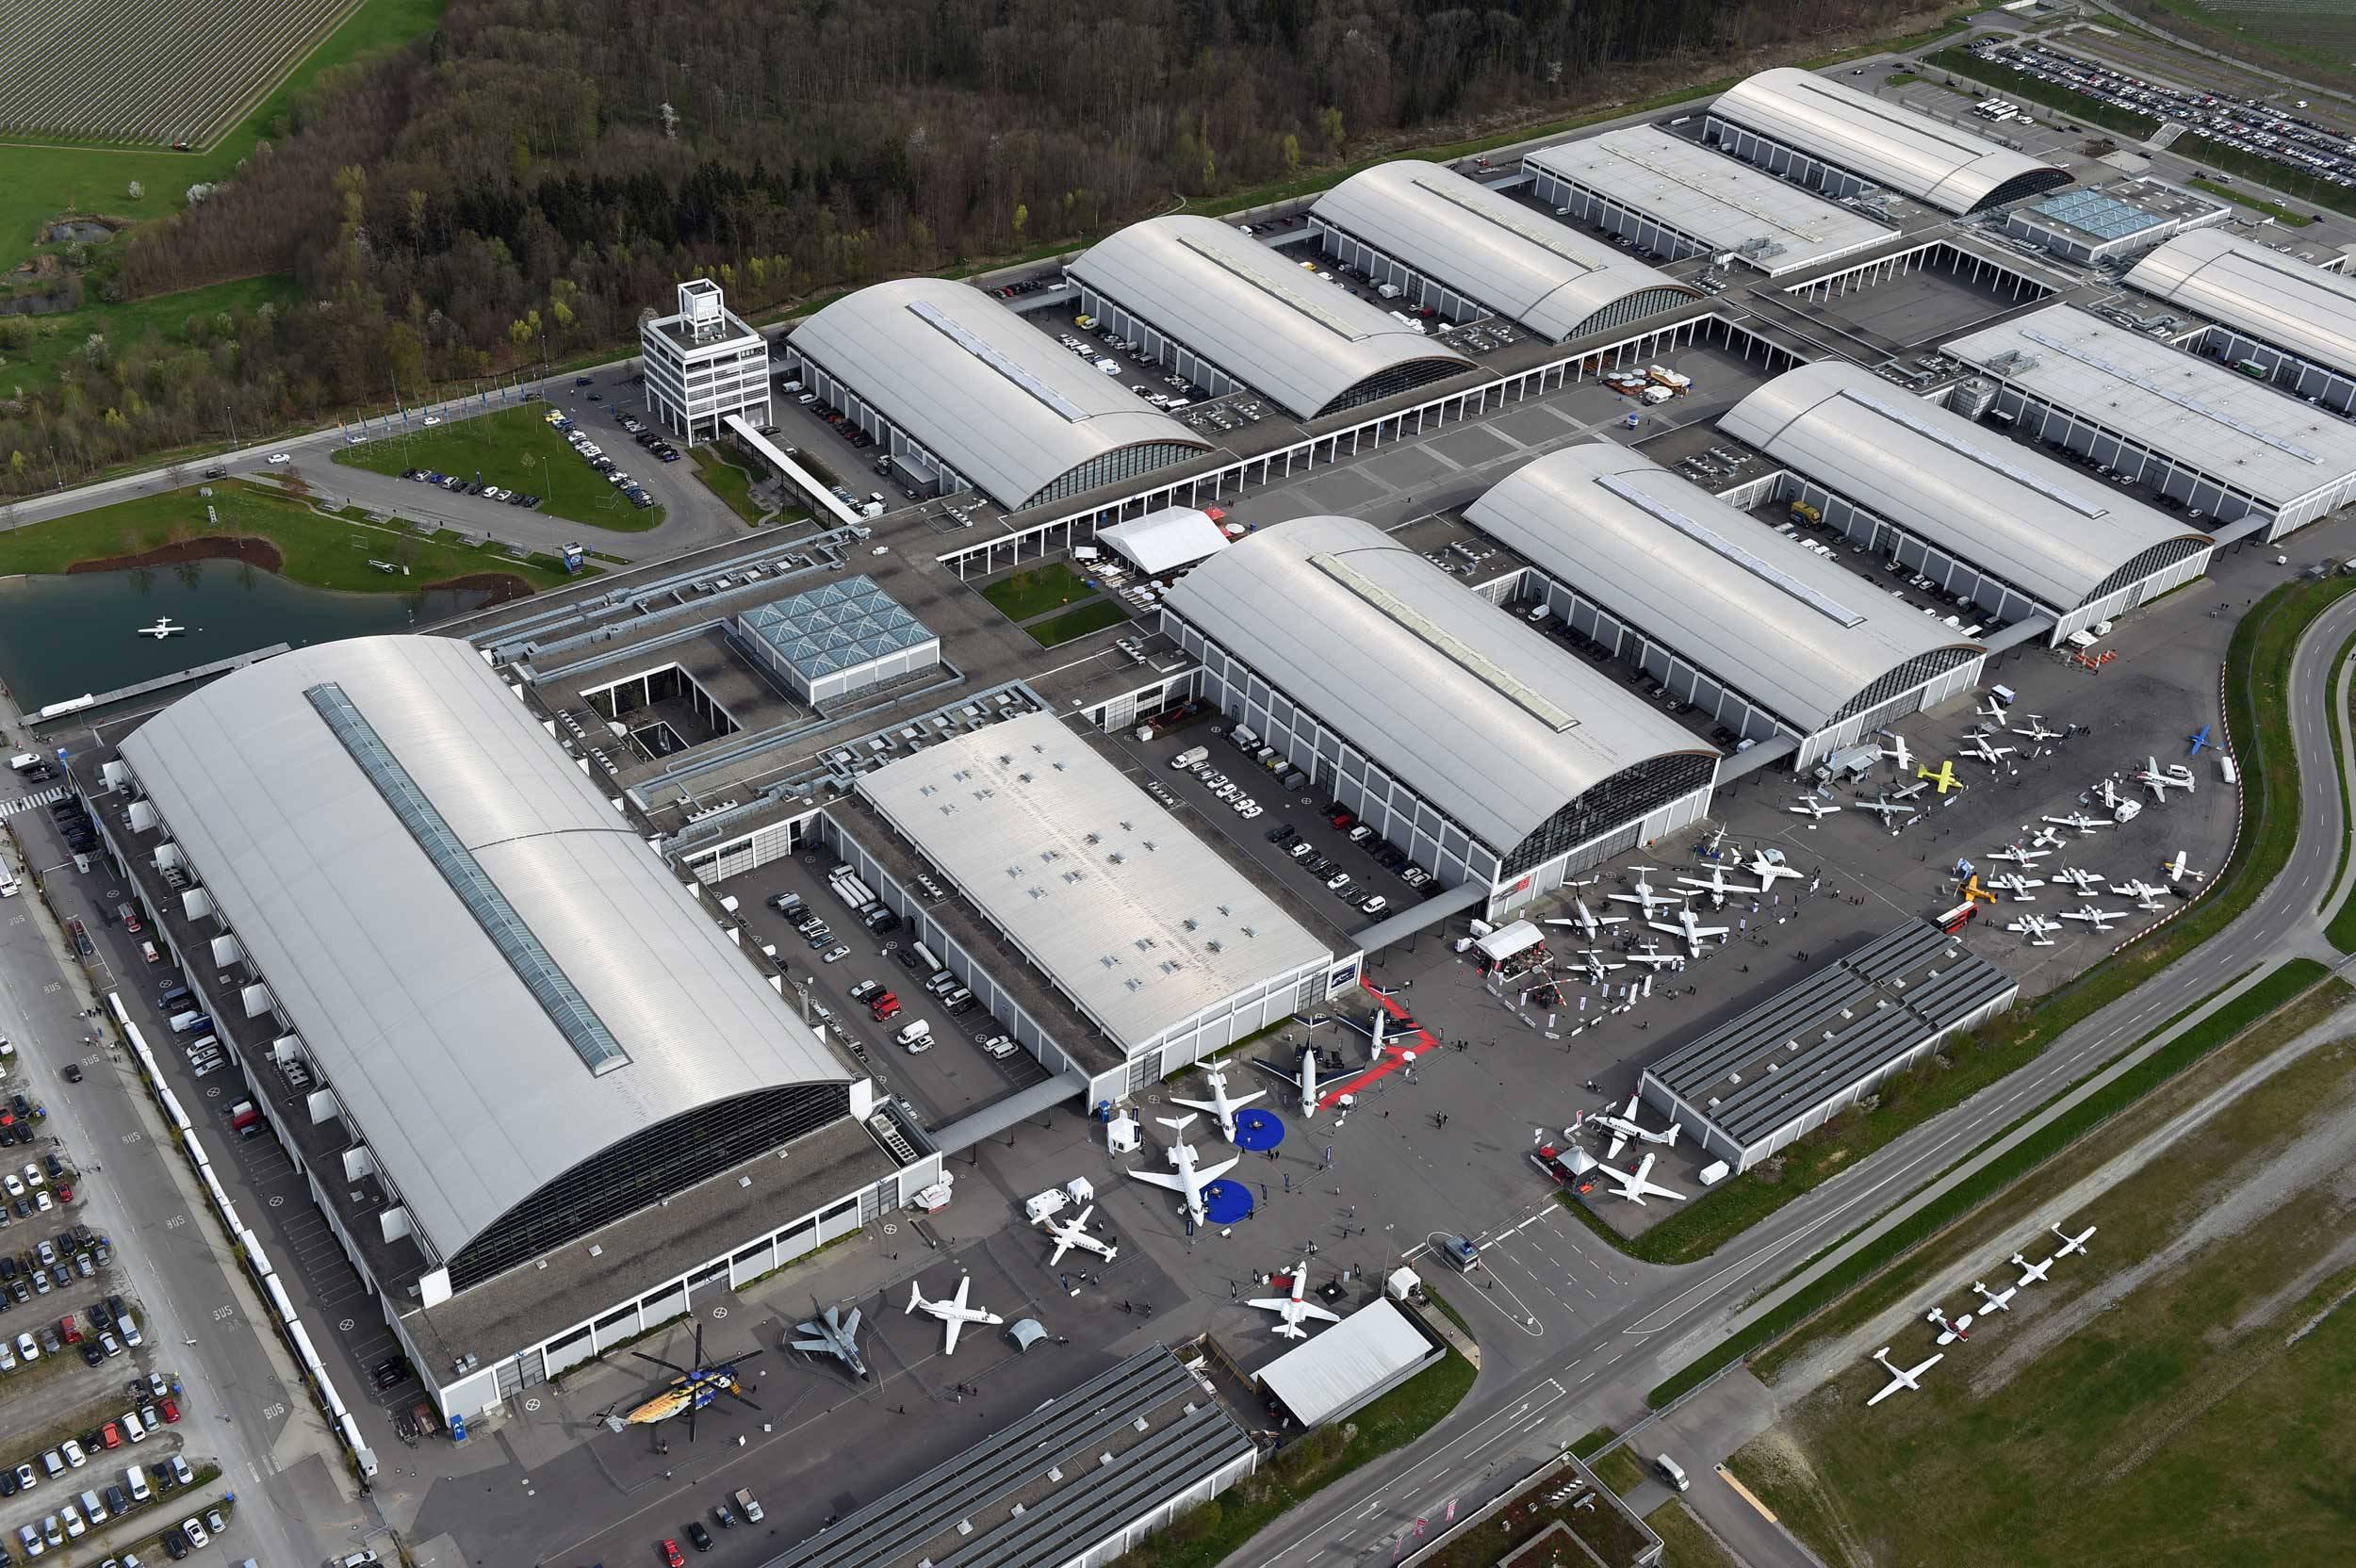 AERO Friedrichshafen_Frisomat_aicraft hangars_PRO-series